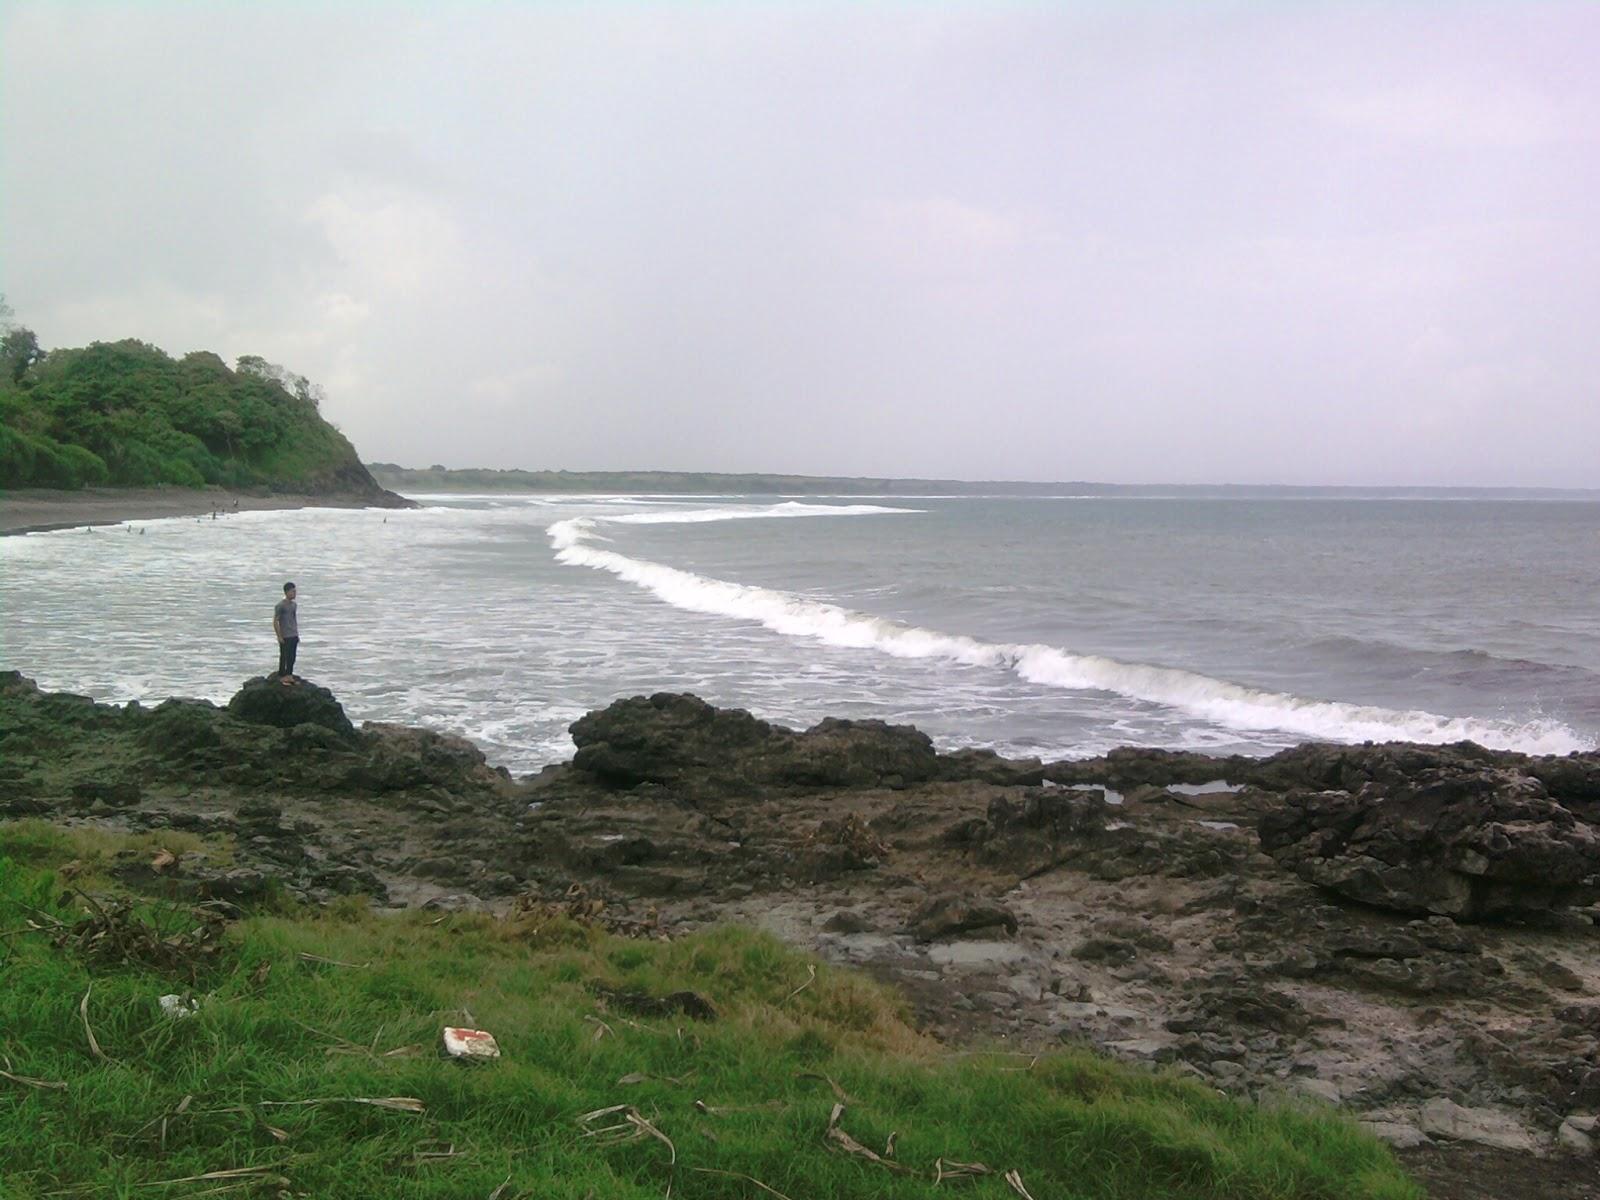 Wisata Indonesia Keindahan Alam Pantai Grajagan Banyuwangi Waktu Bisa Memancing